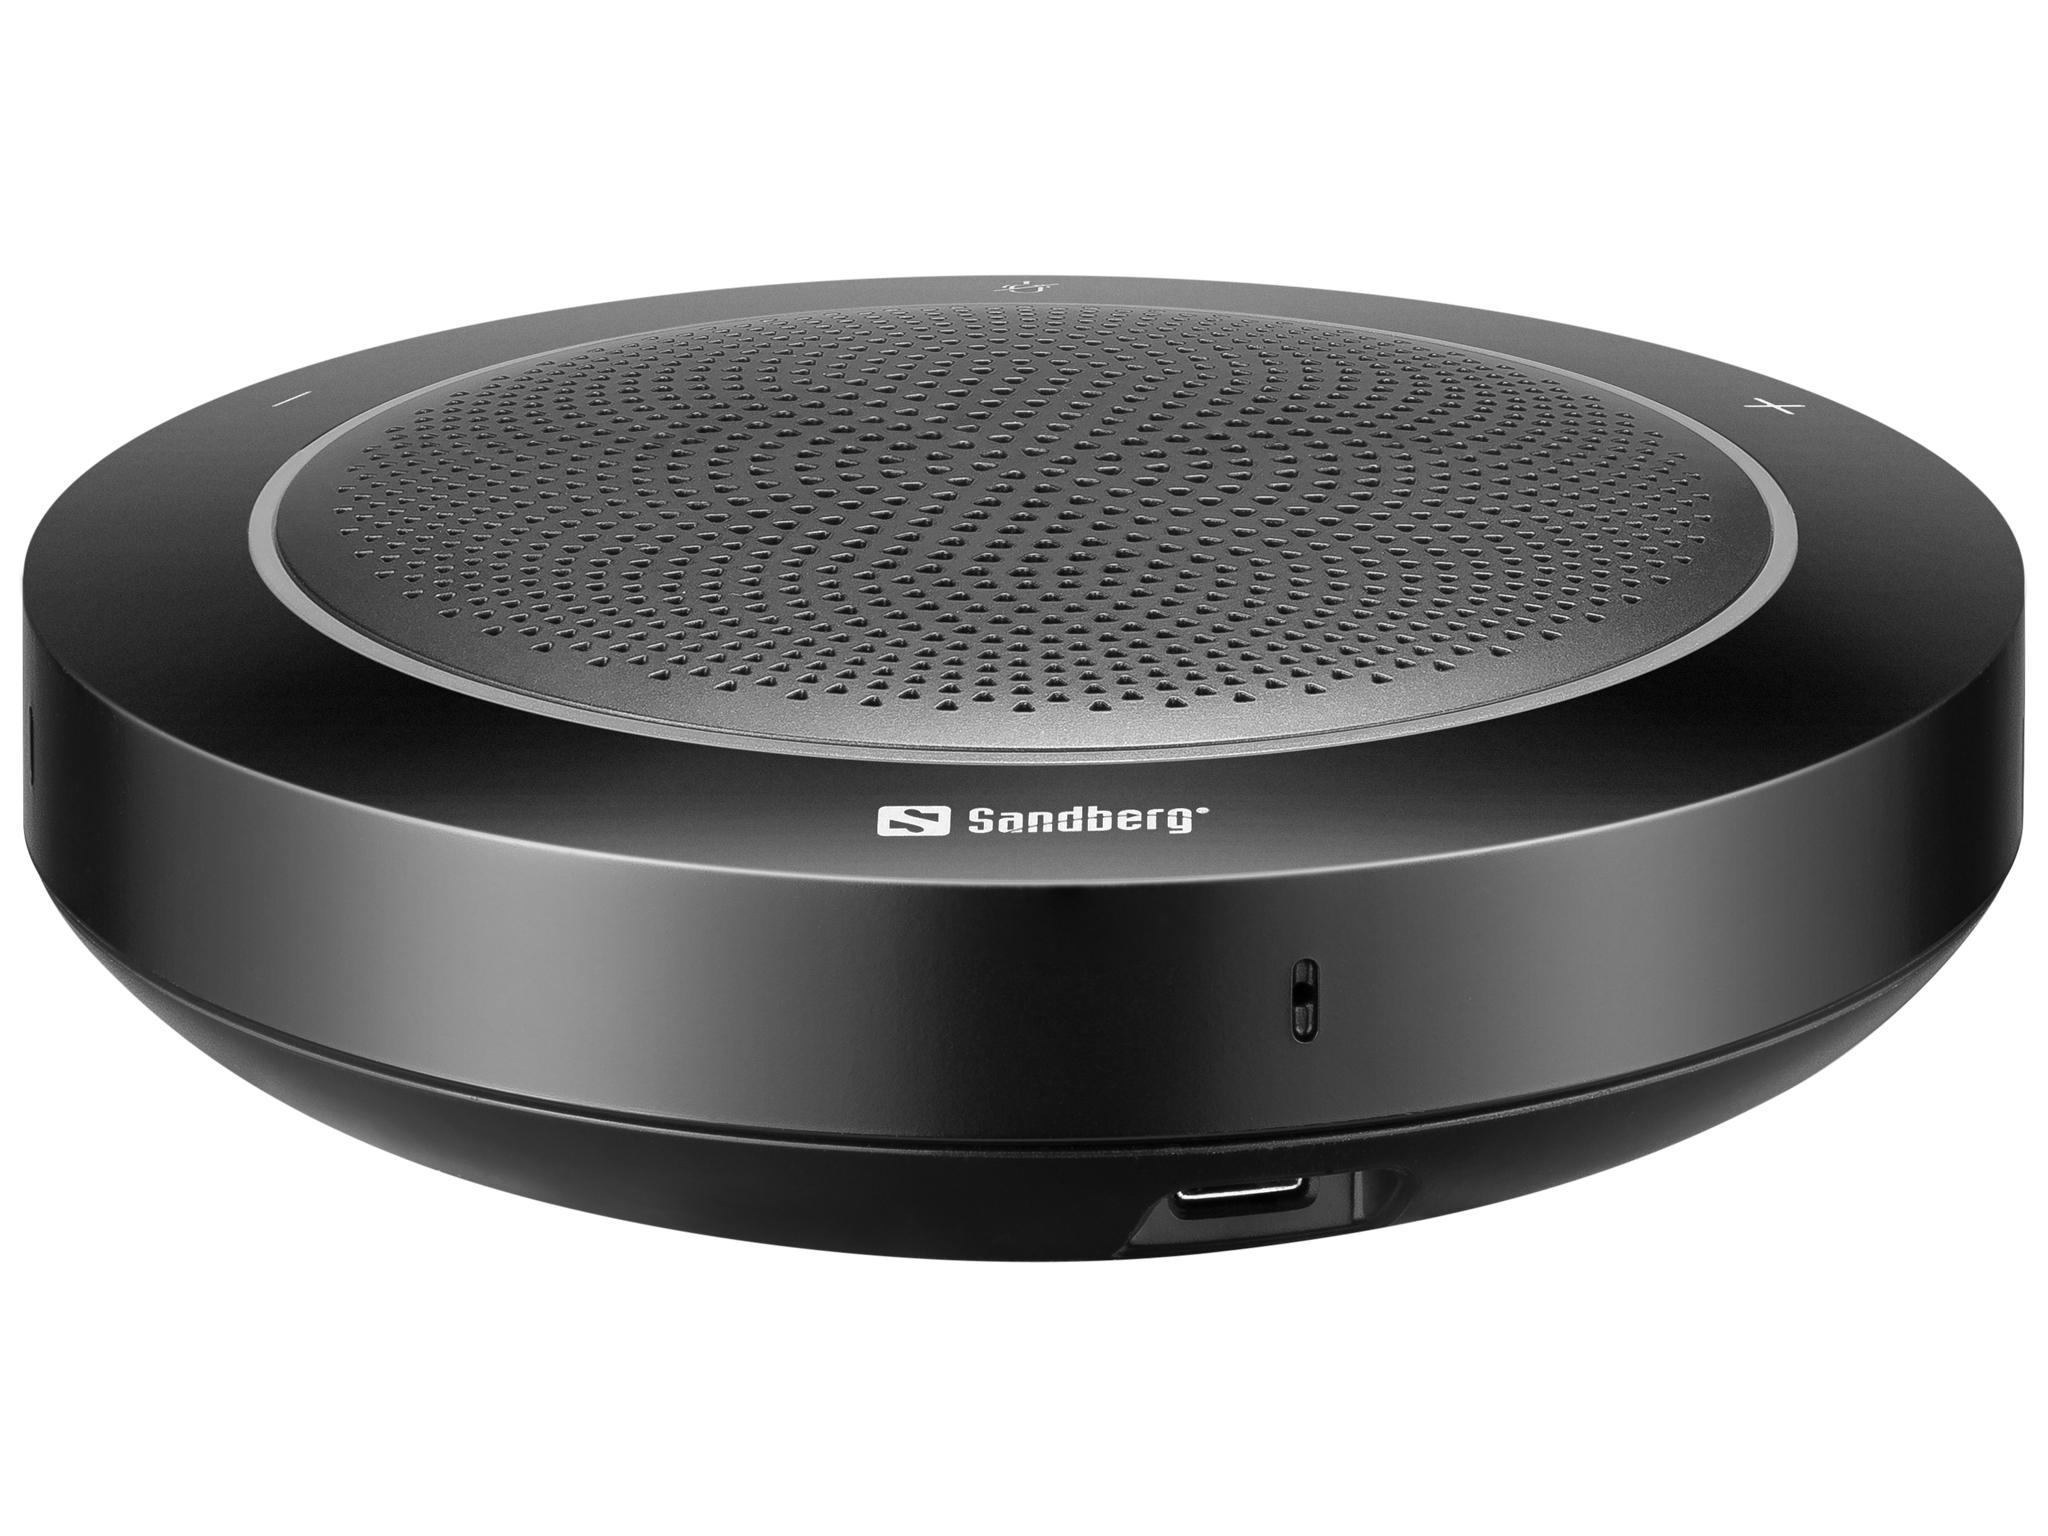 Sandberg USB Speakerphone Pro, microfoon en speaker in 1, echo vrij